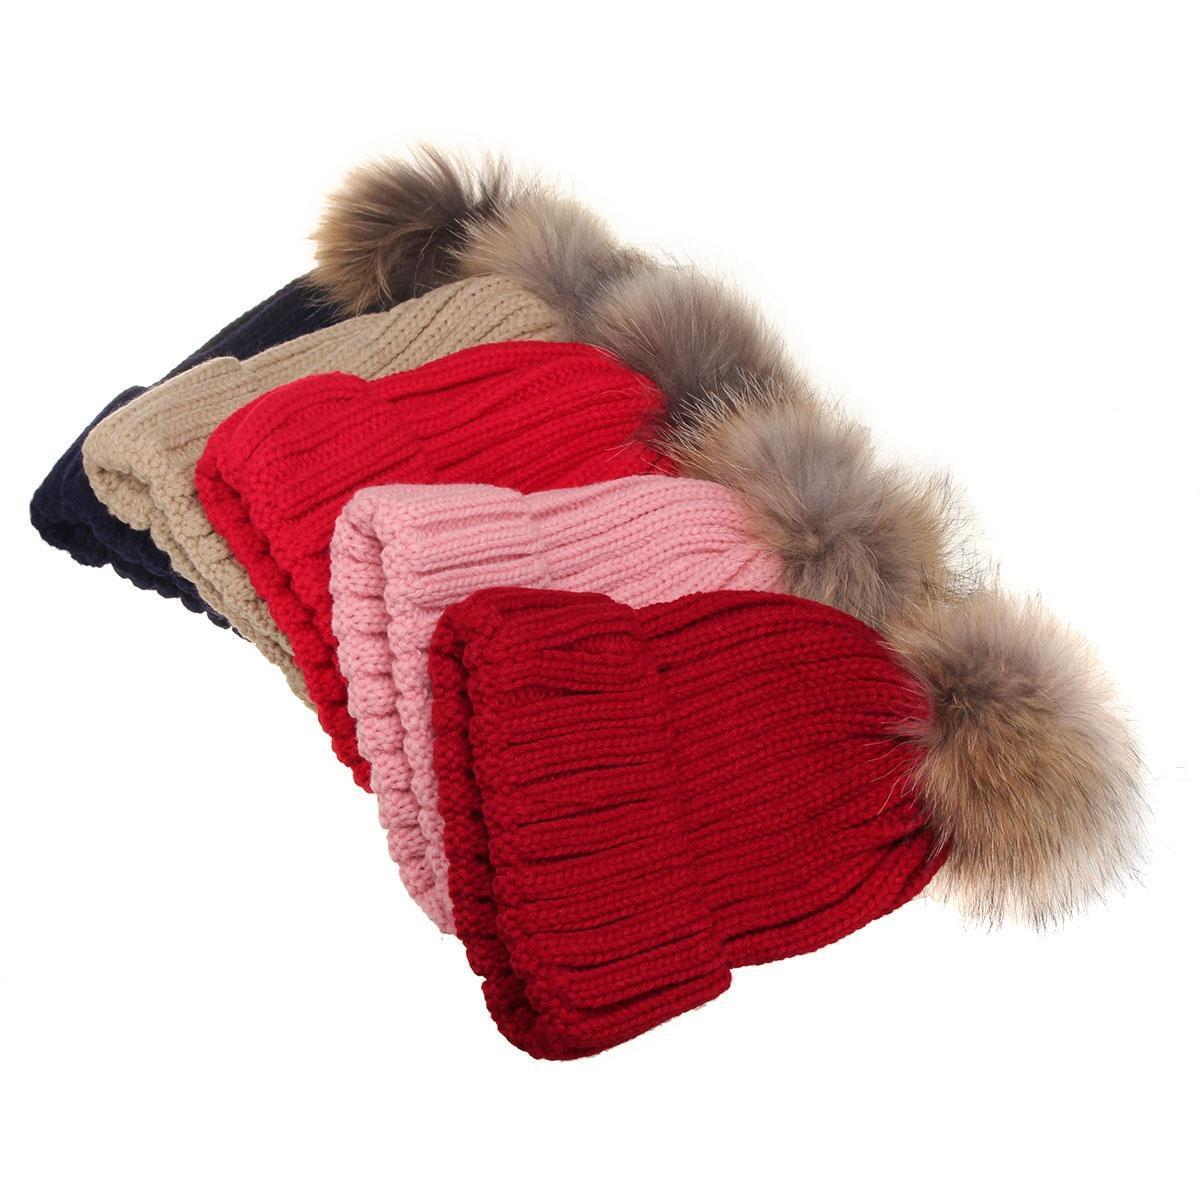 Мода женщин зимой 15 см меха Pom мяч вязаный крючком мешковатые Bobble Hat Beanie лыж Cap hot winter beanie knit crochet ski hat plicate baggy oversized slouch unisex cap